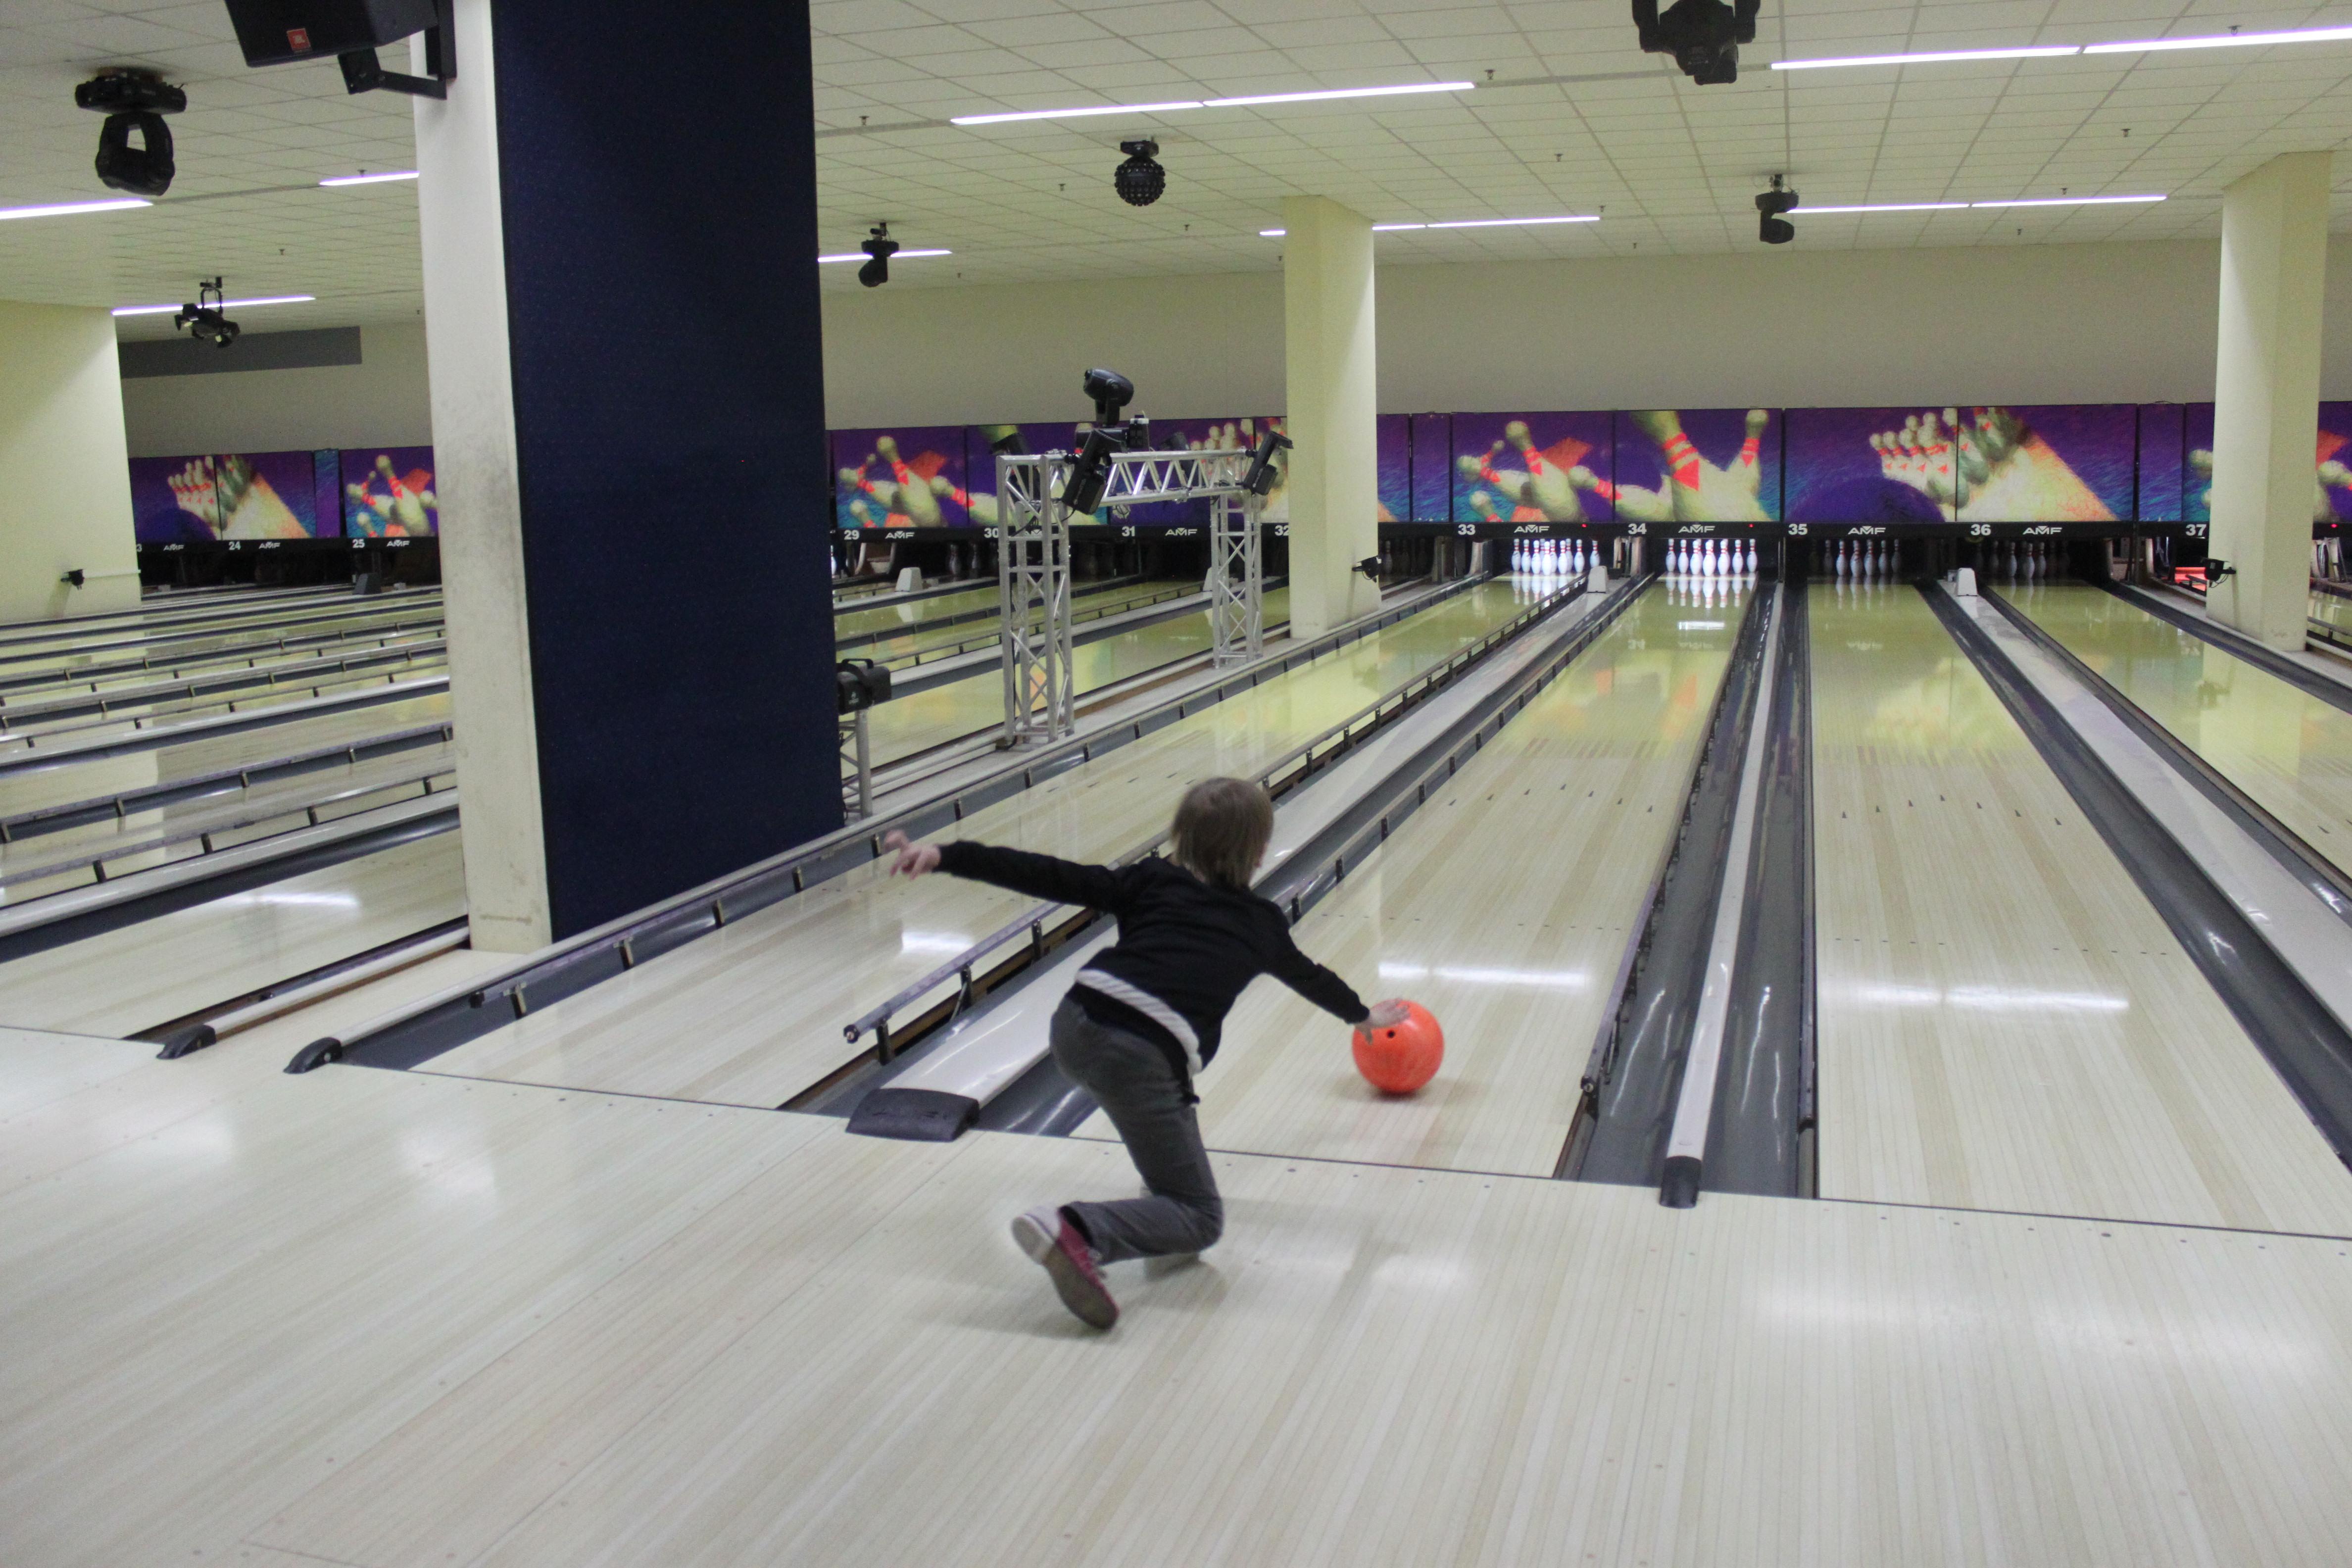 Strike - Rabauken machen Bowlingbahn unsicher